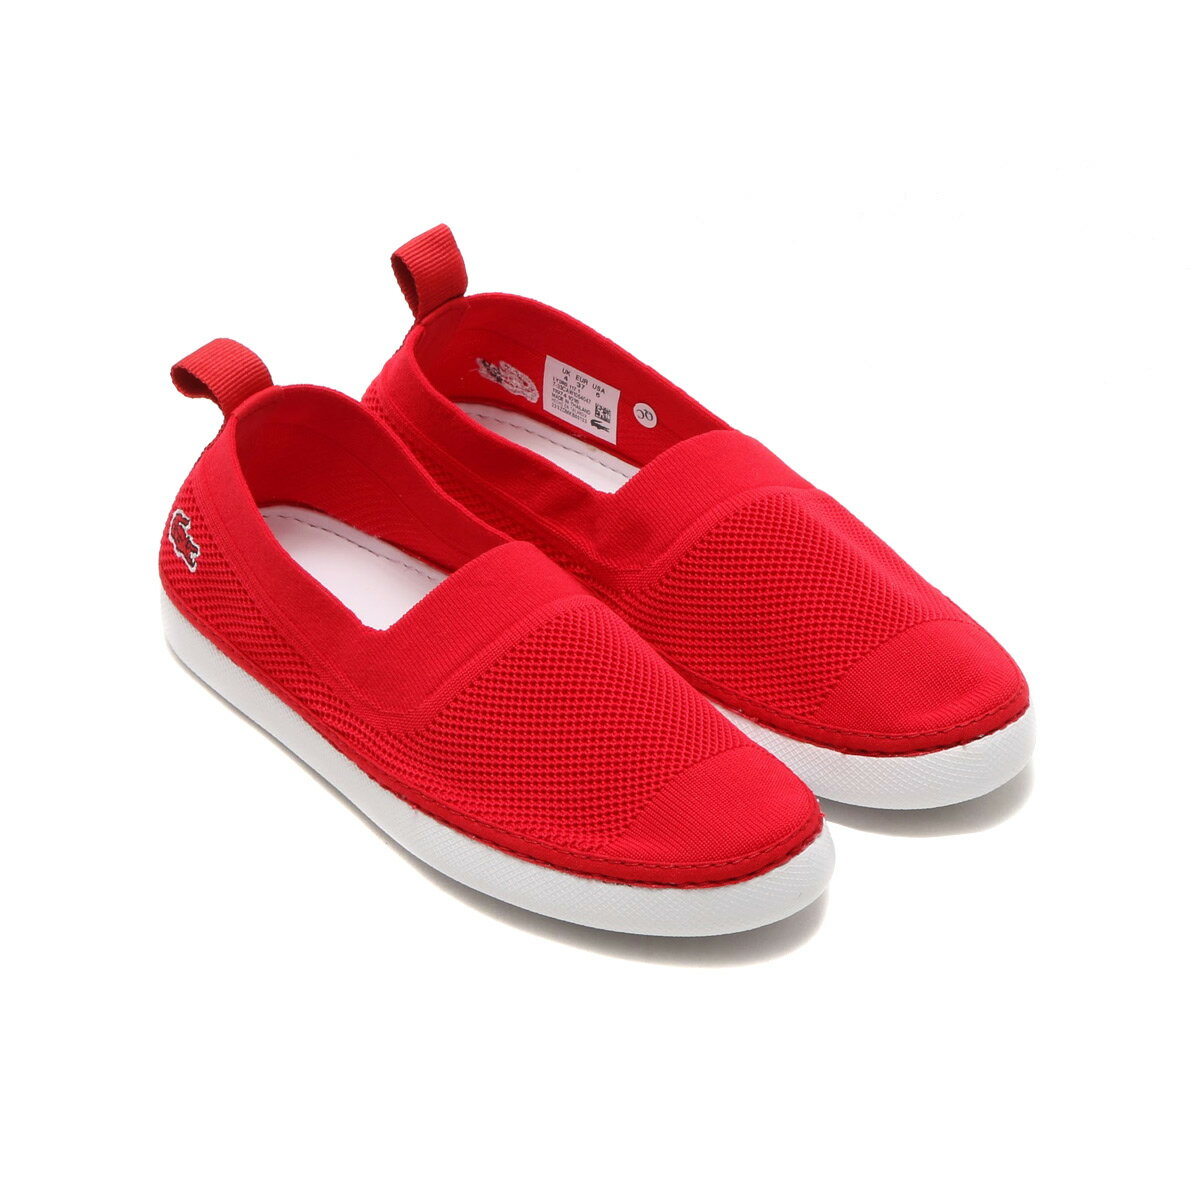 LACOSTE L.YDRO 117 1 (ラコステ L.YDRO 117 1) RED【レディース スニーカー】17SP-I